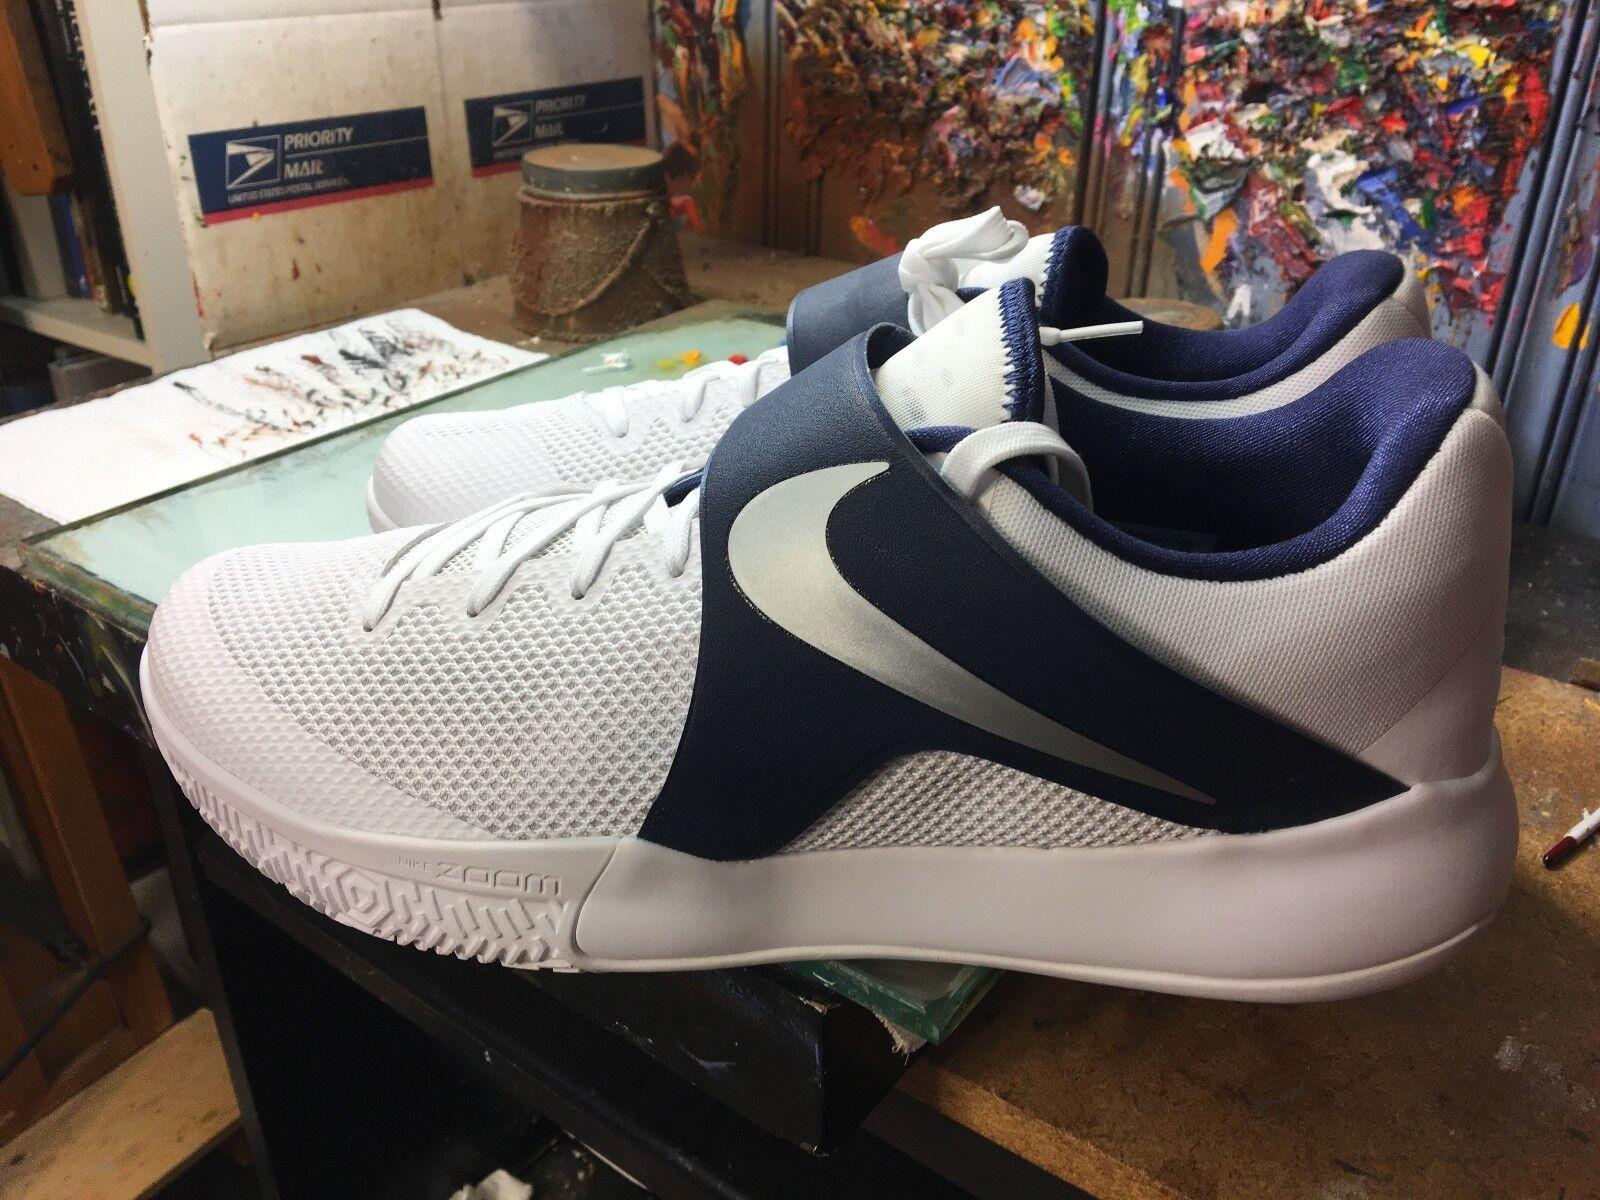 Nike Zoom Live TB Promo White/Metallic Silver NIB Size US 14 Men's 902590 141